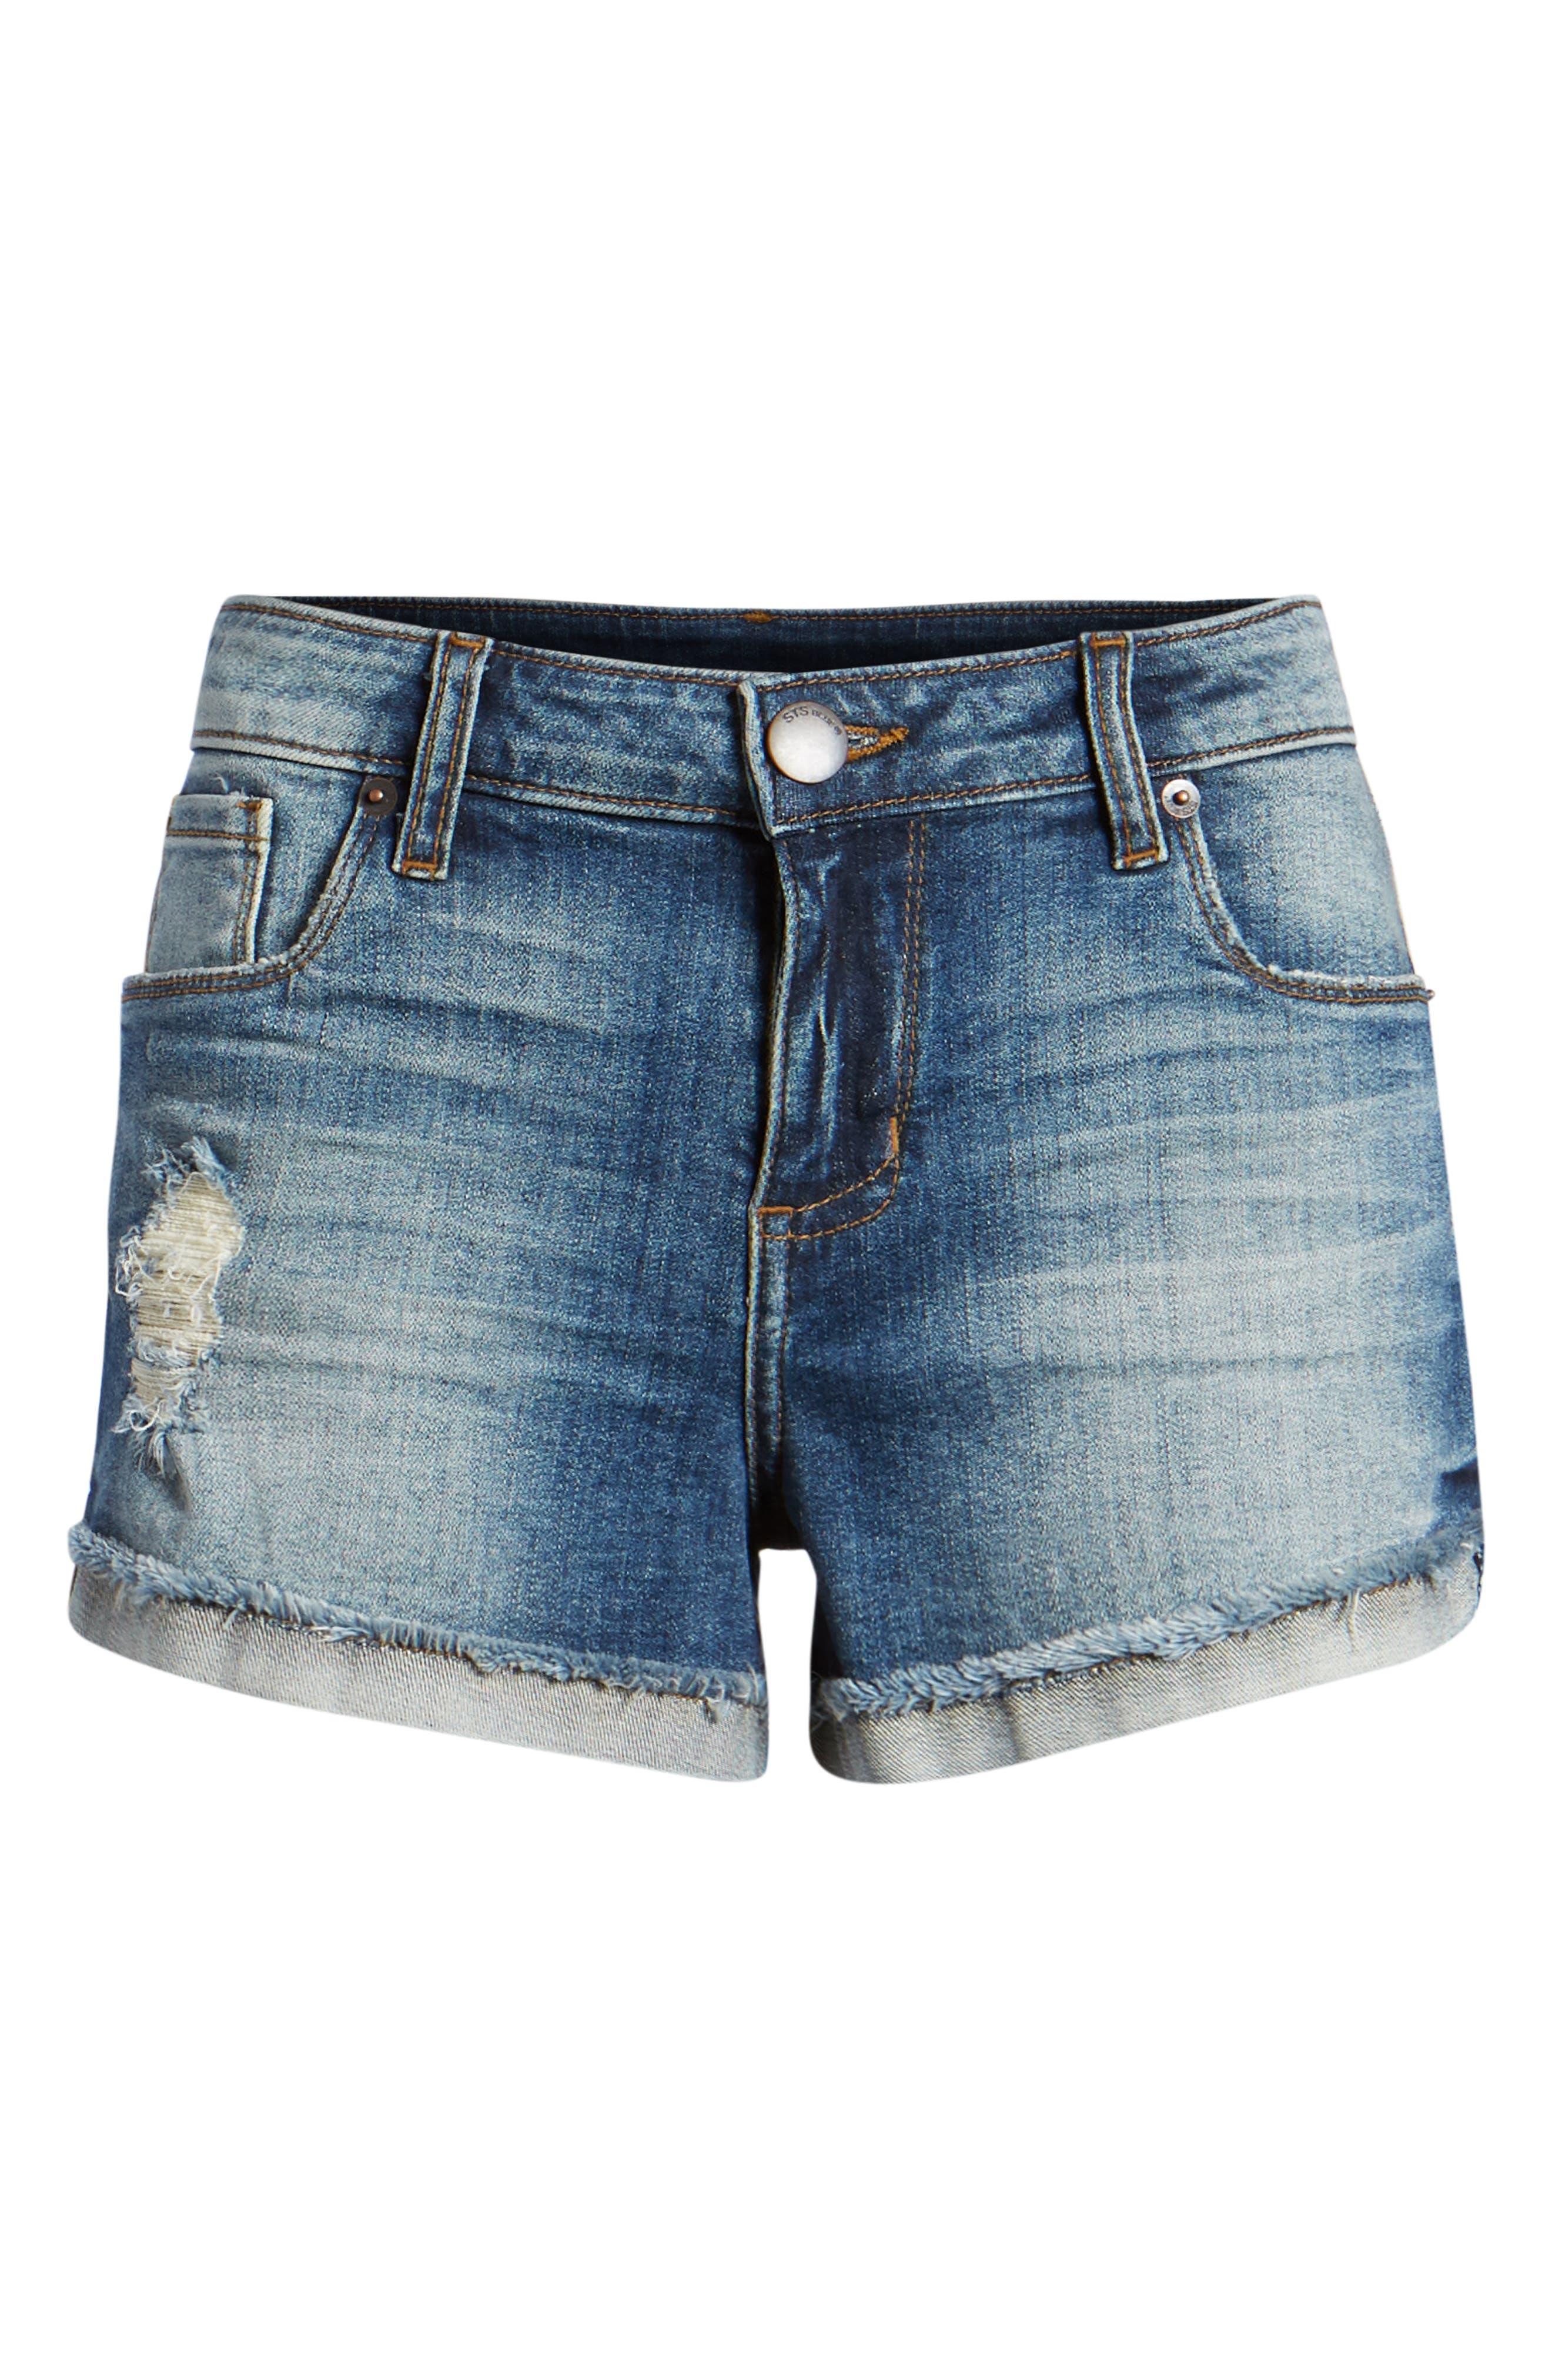 Boyfriend Denim Shorts,                             Alternate thumbnail 7, color,                             Menlo